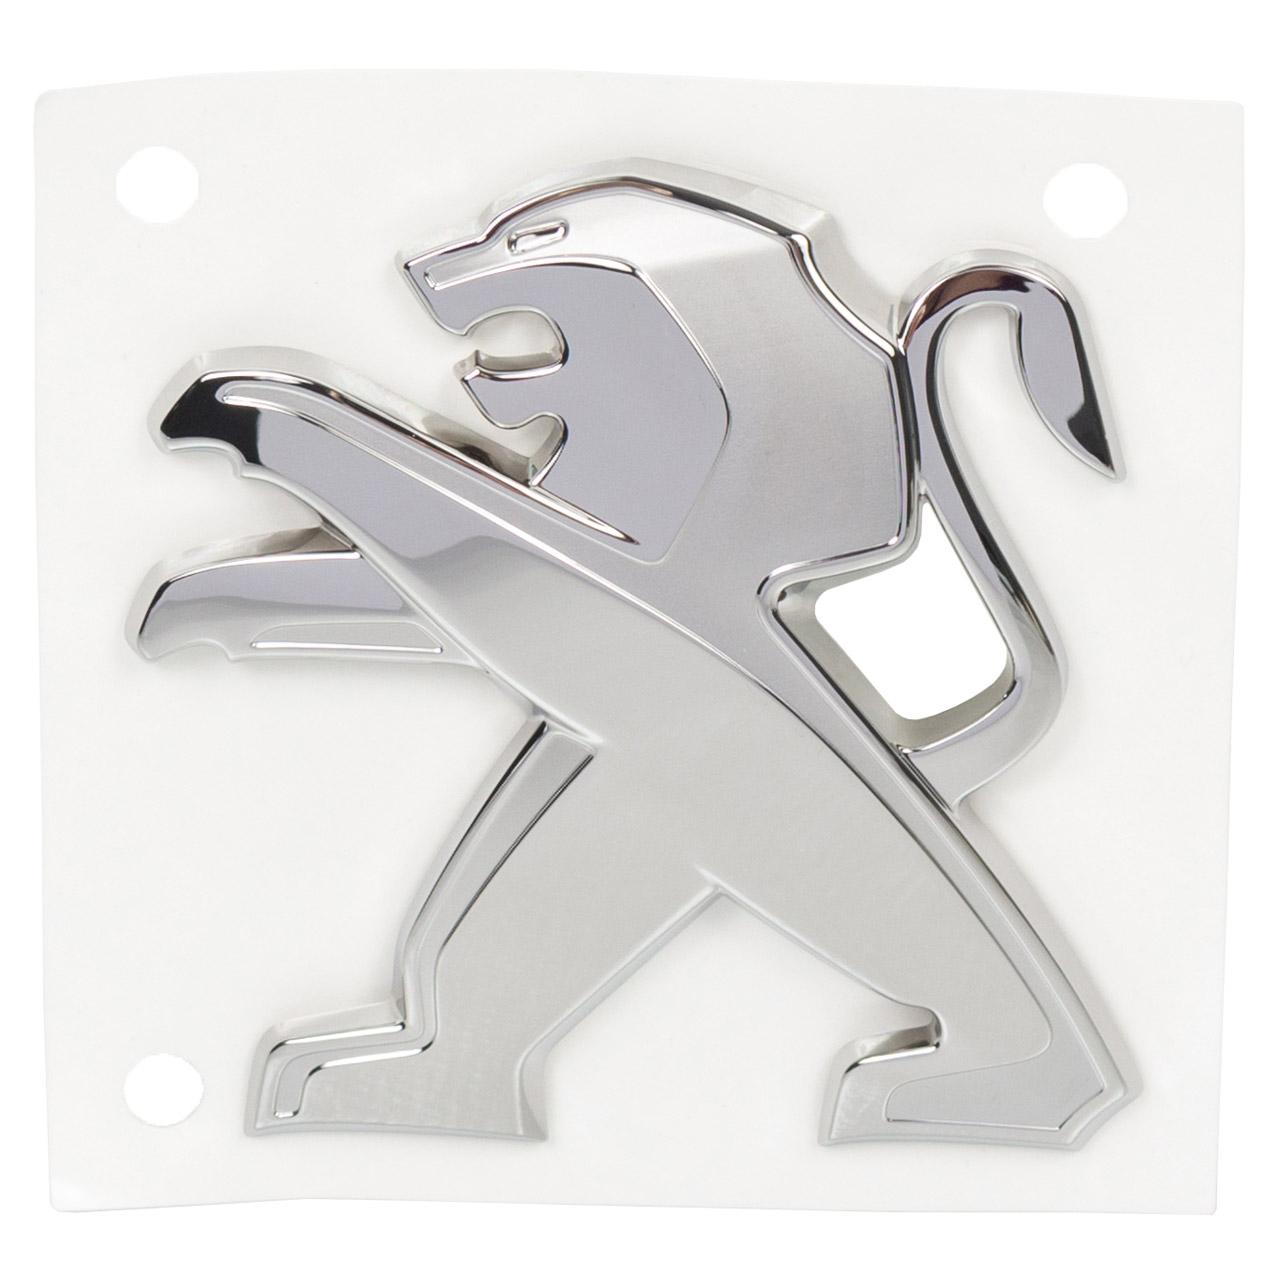 ORIGINAL Peugeot Emblem Logo Schriftzug Heckklappe 508 II 508 SW II 98361548DX